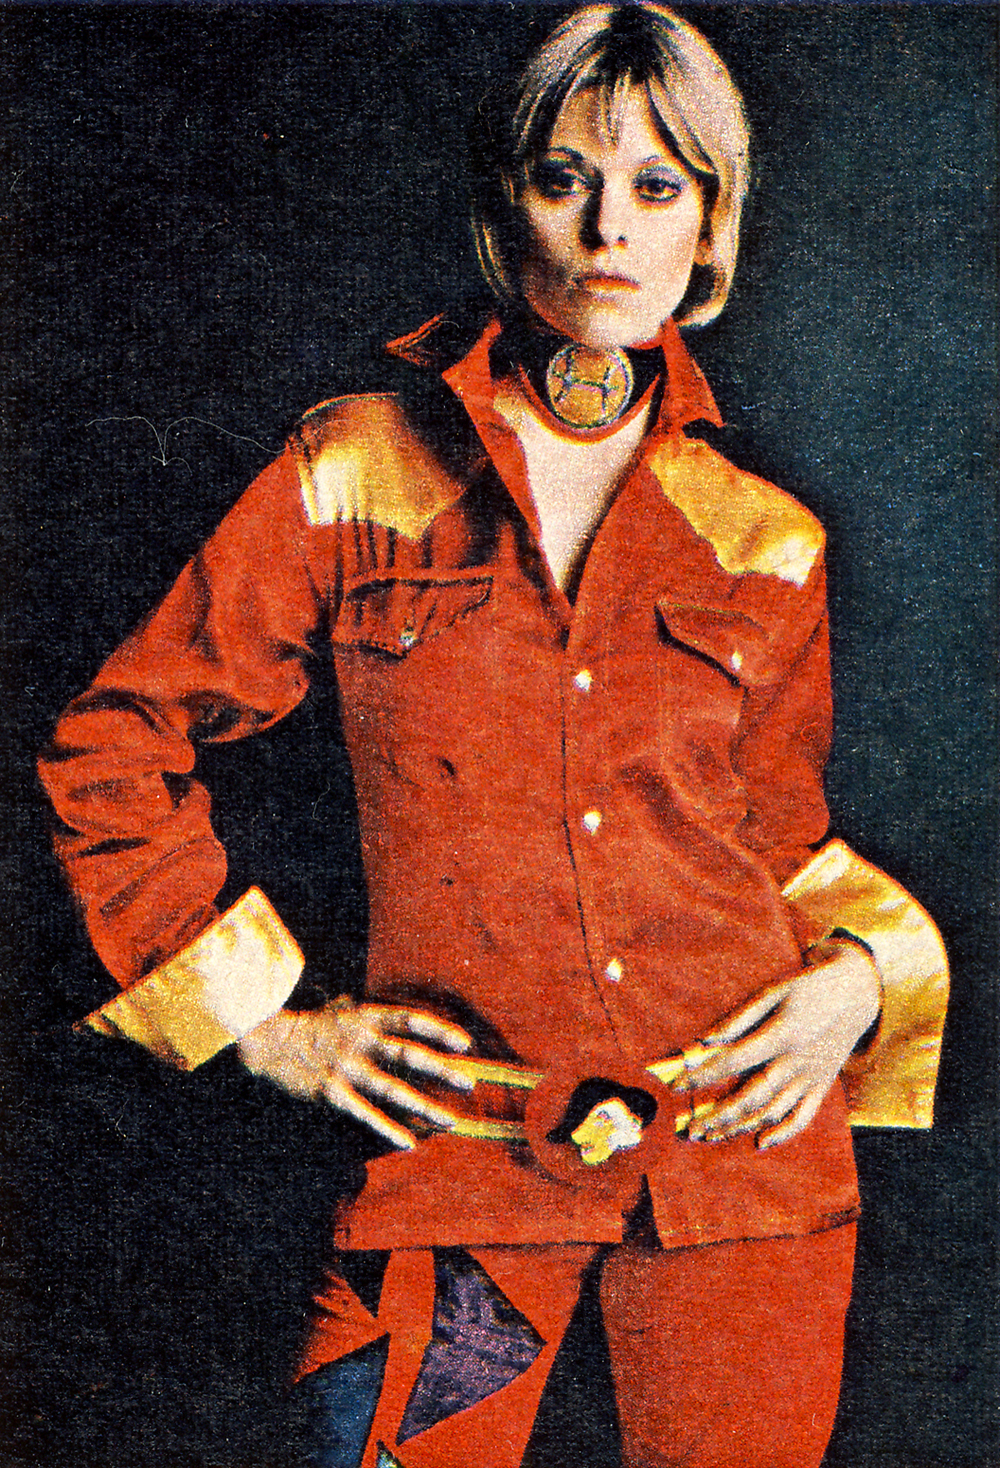 edina ronay emmerton lambert hans feurer june 1970 b